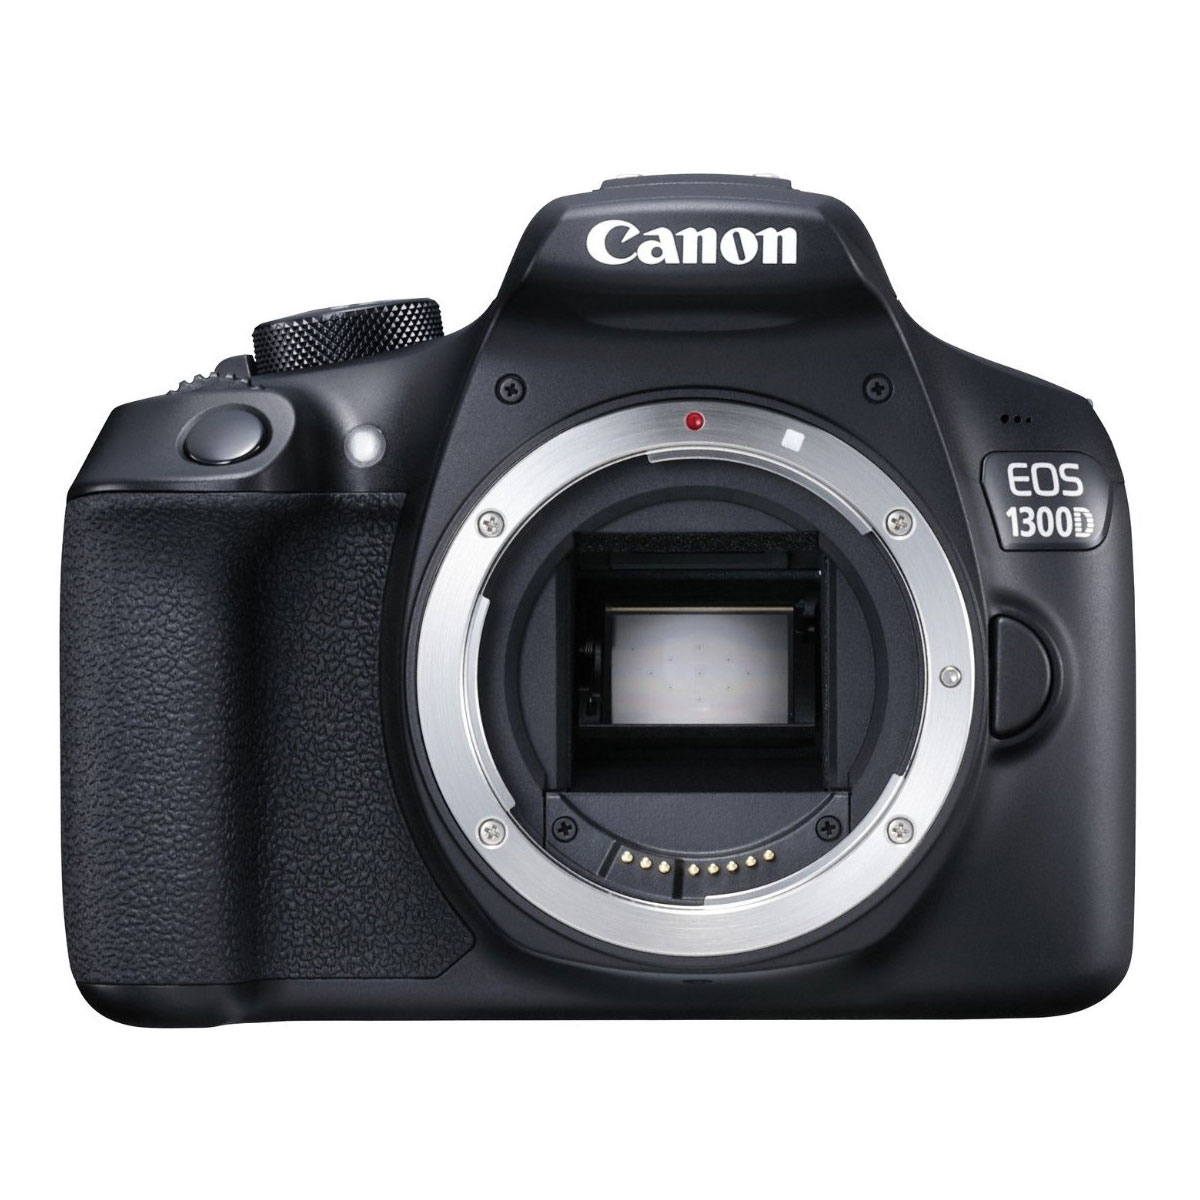 appareil photo canon 1300d